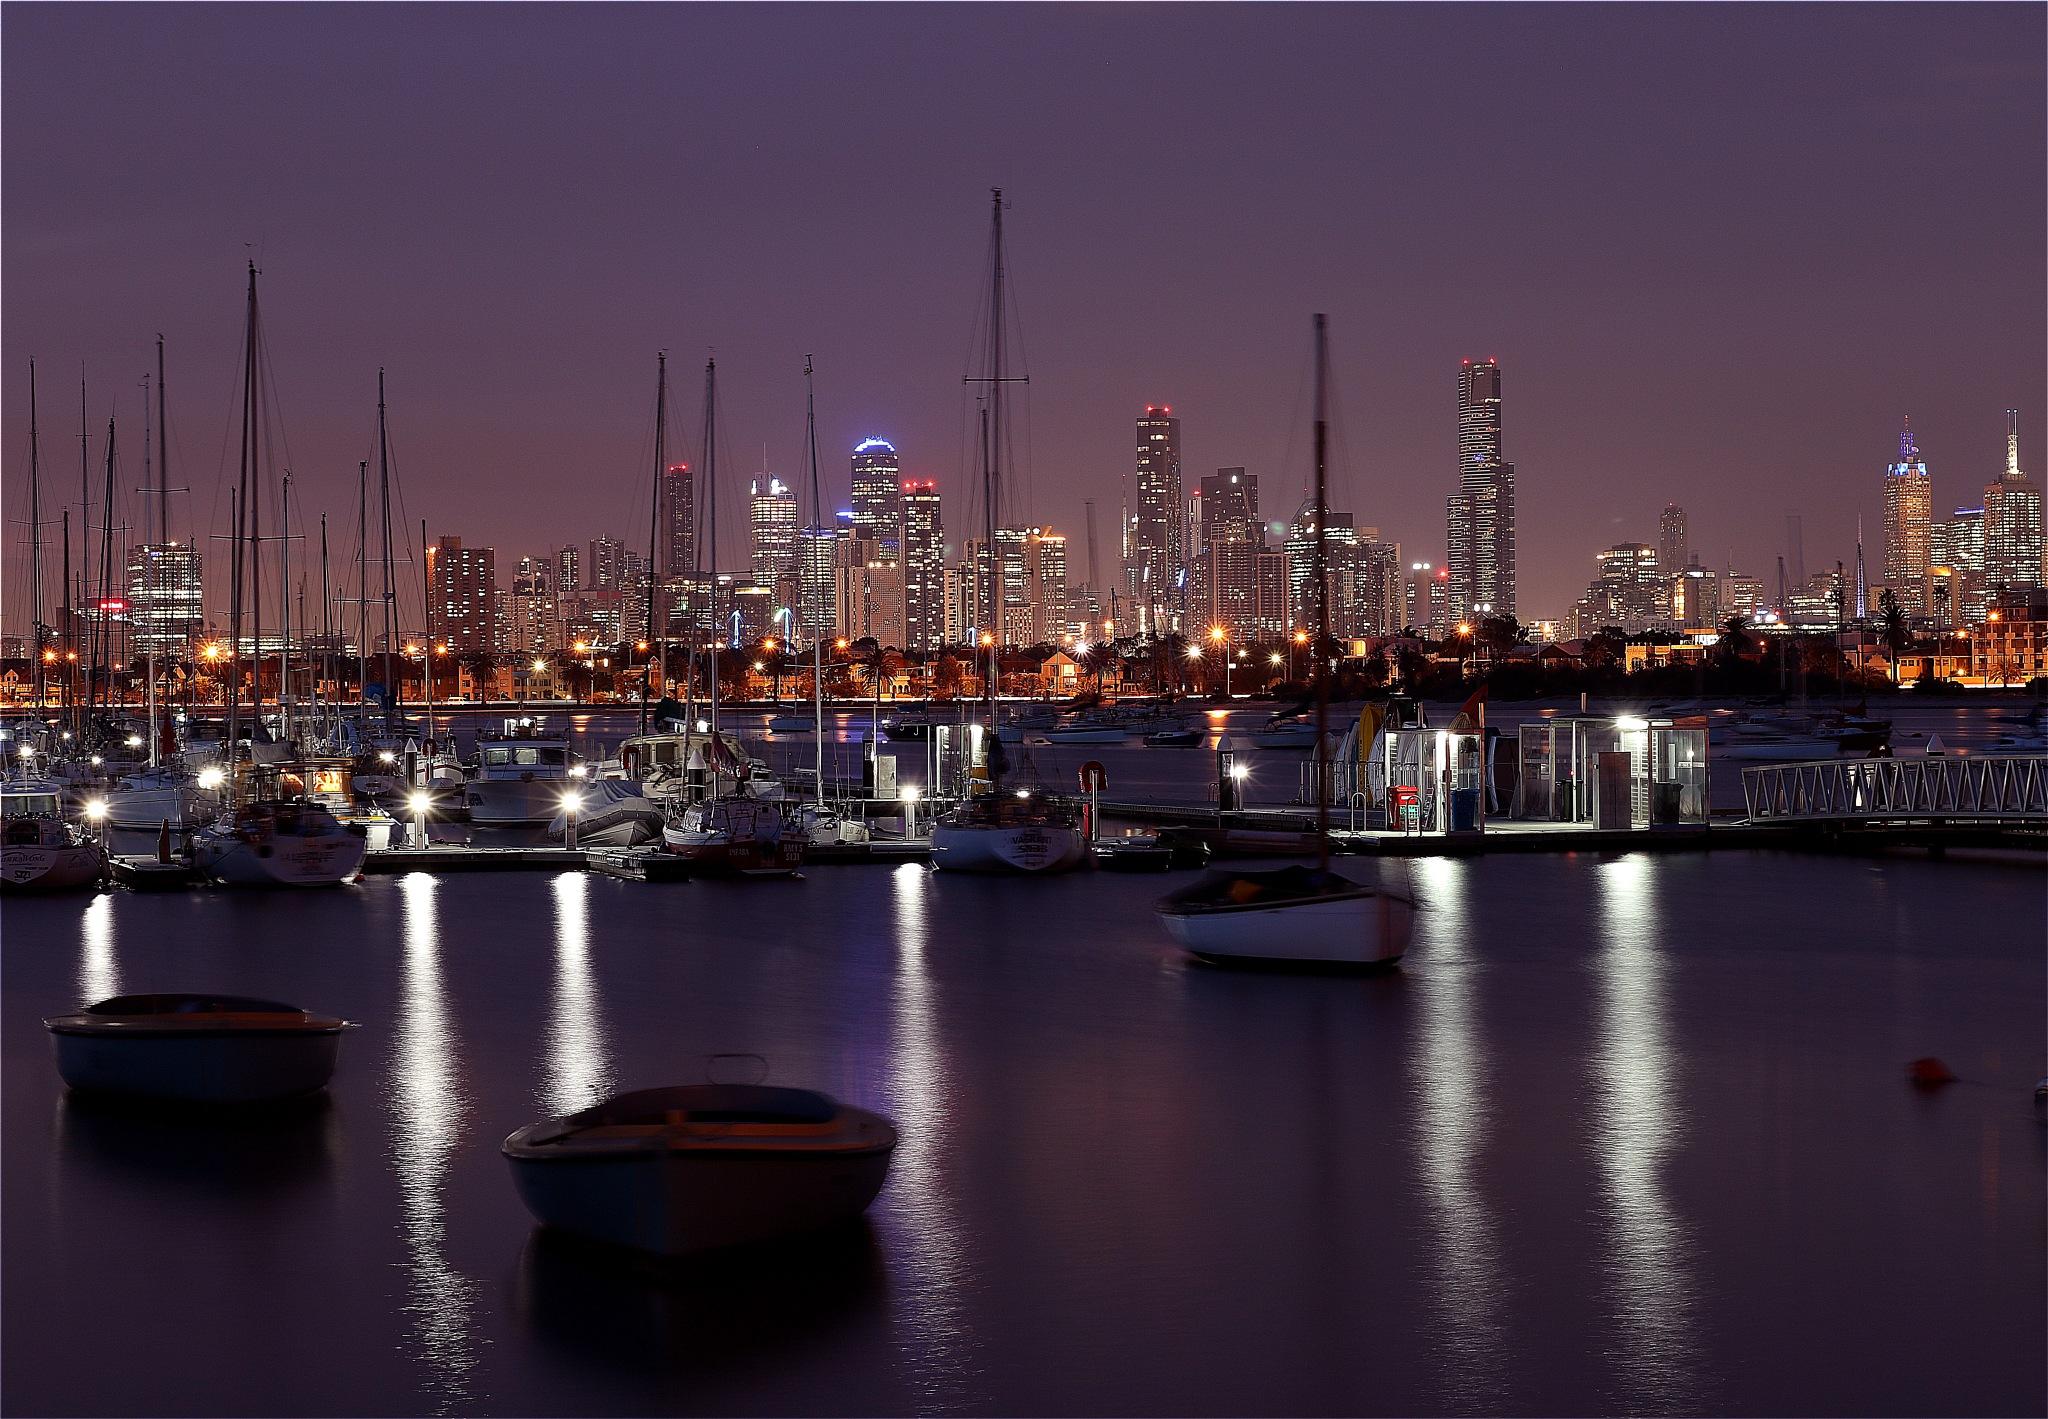 """Melbourne Skyline"" by Luca Fabbro"